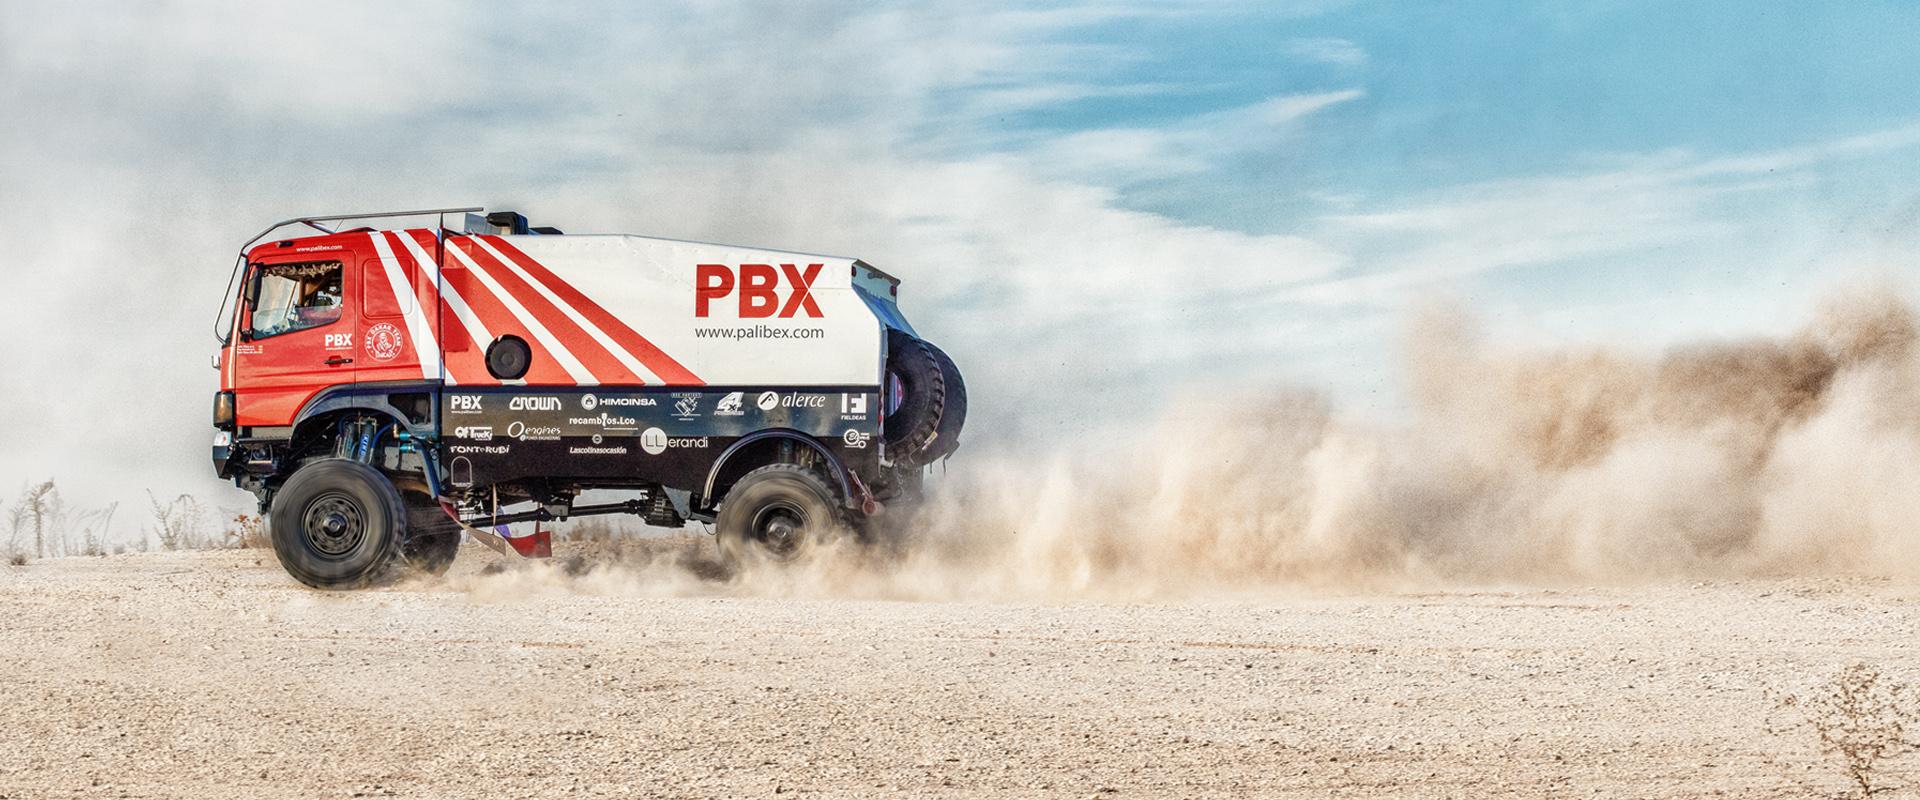 Palibex termina el Dakar 2019